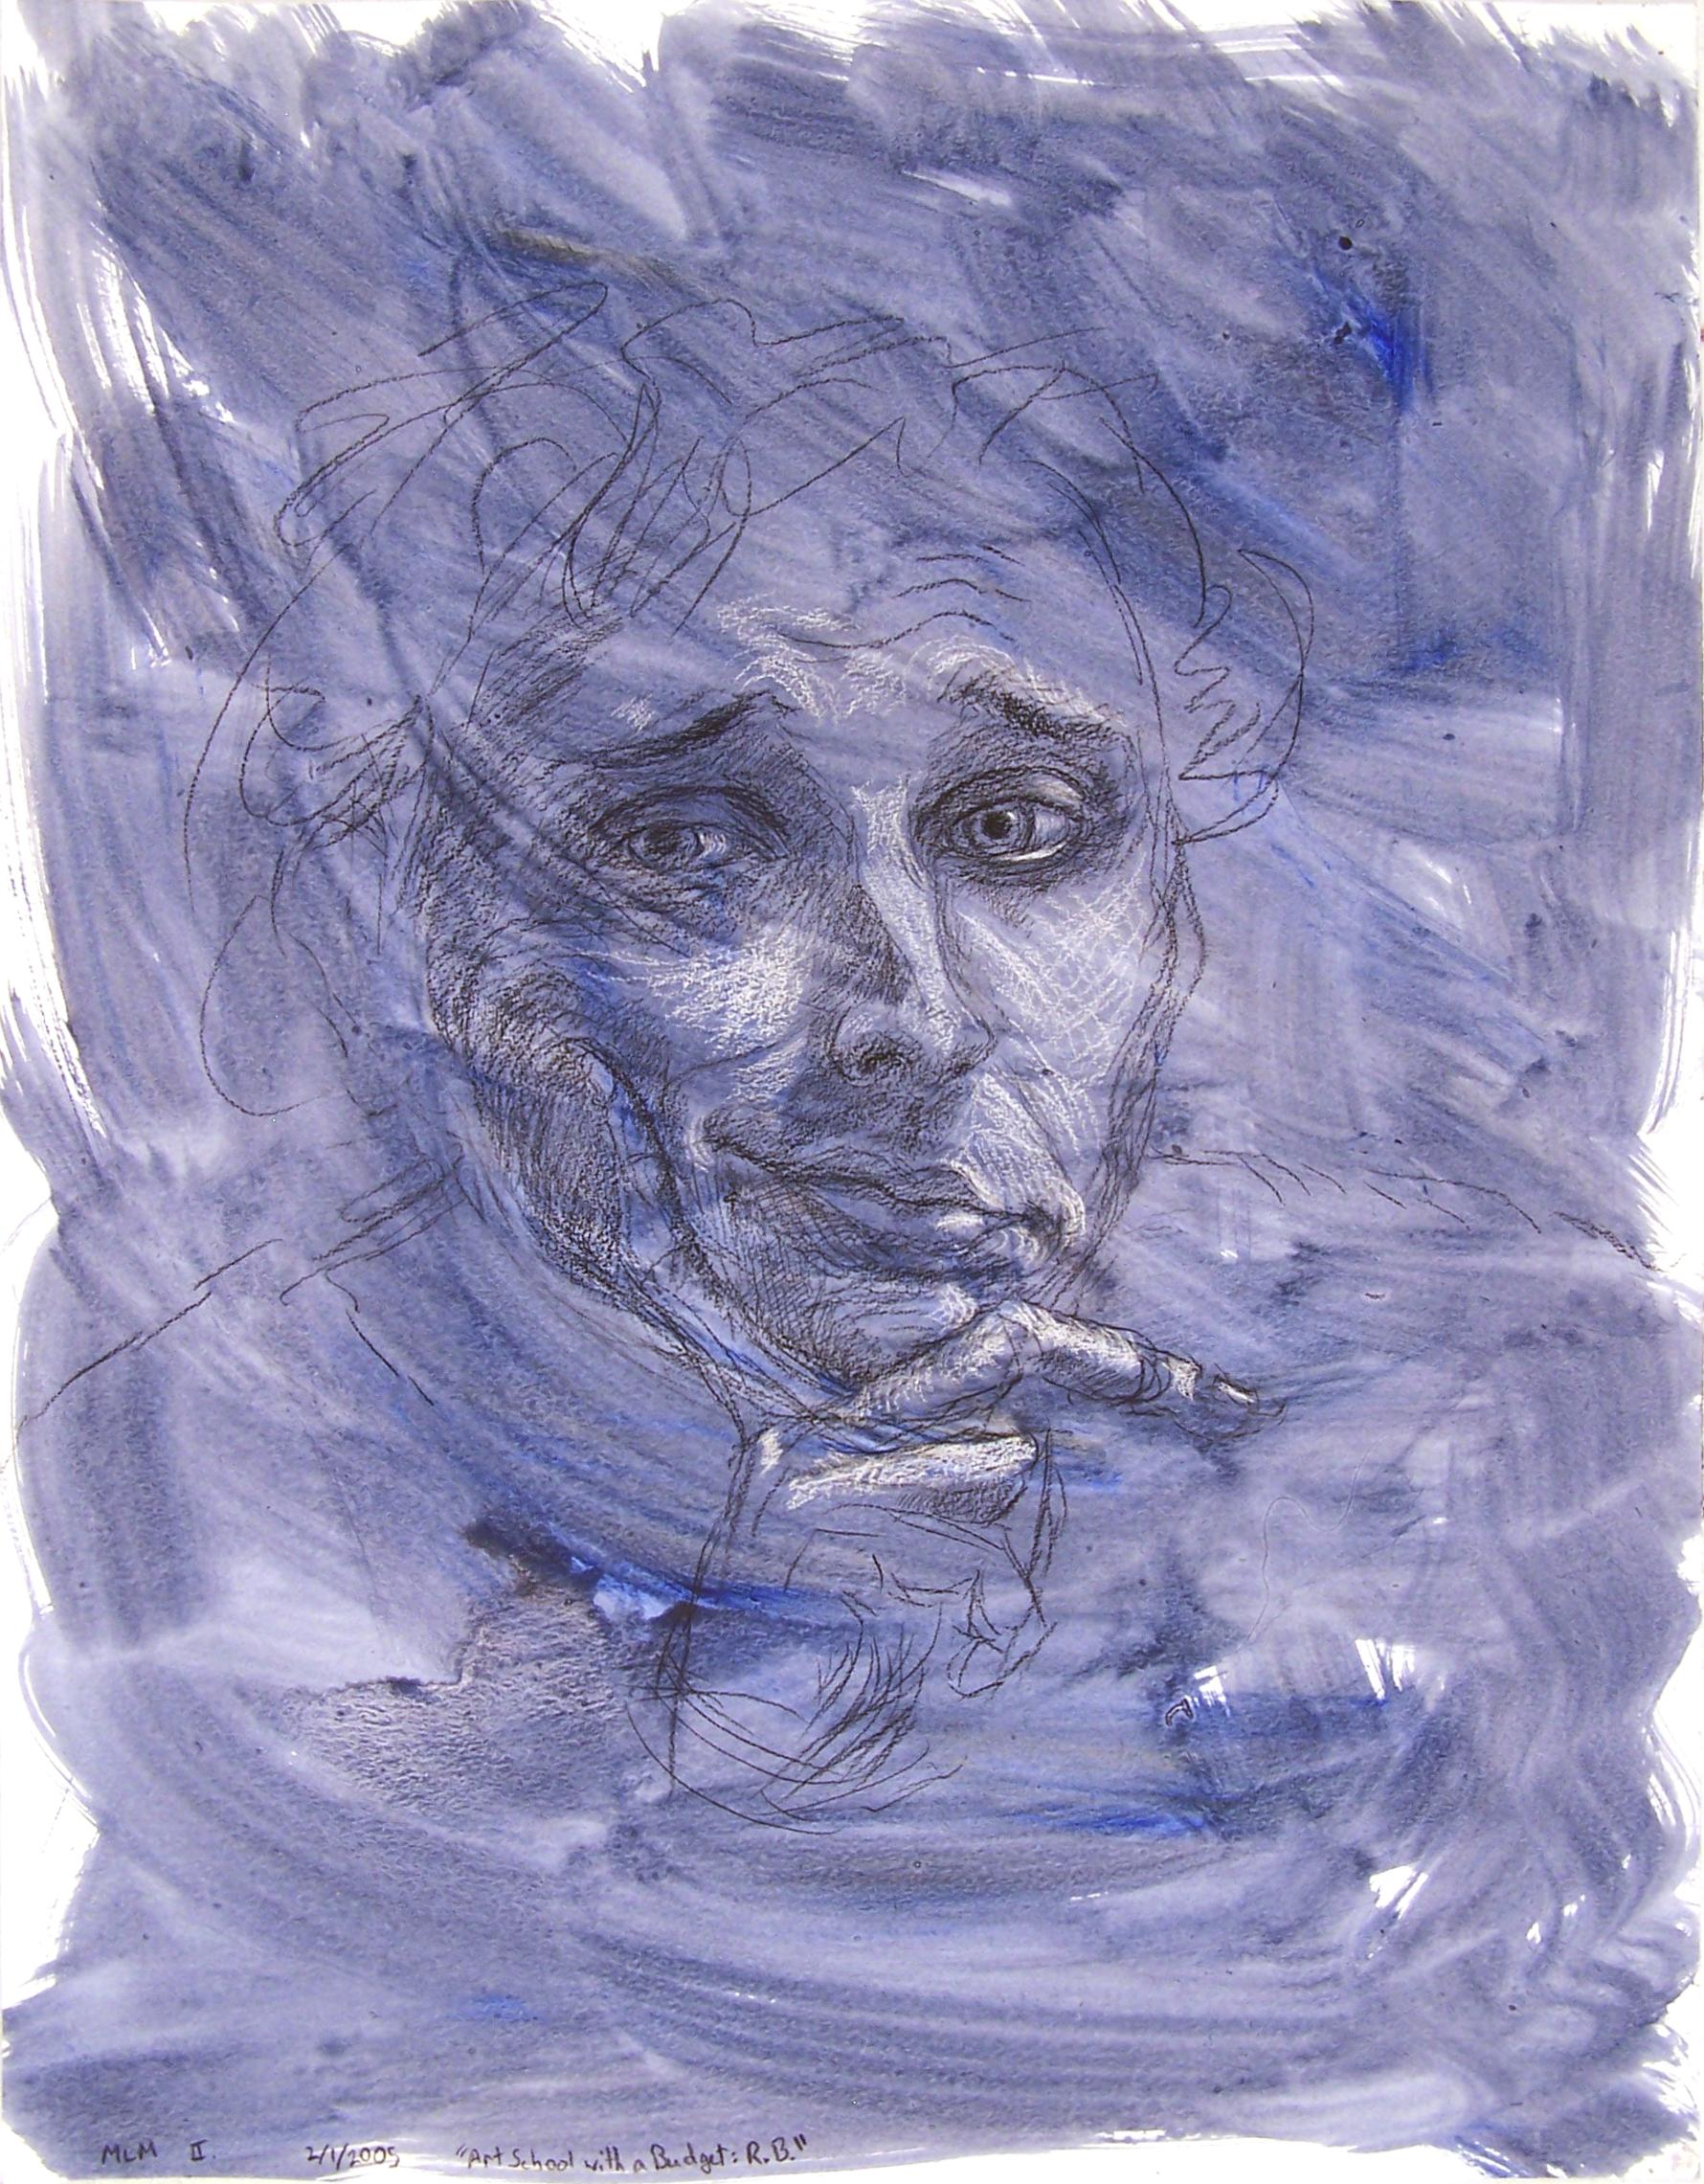 MeadMcLean-ArtShow-2005-ConteAndAcrylicOnPaper-30x22inches.jpg